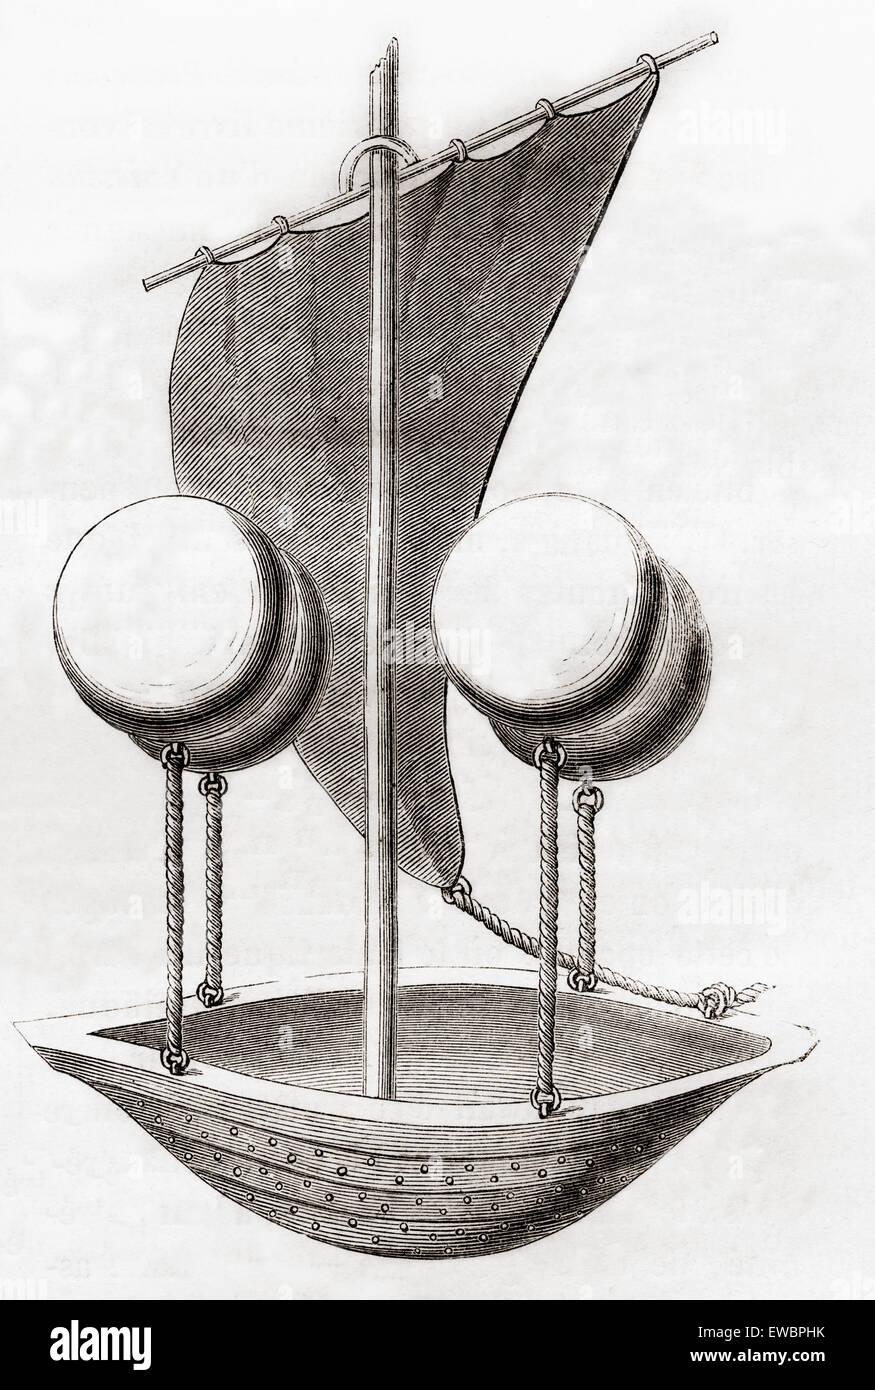 Francesco Lana de Terzi nel suo flying boat concetto c.1670. Francesco Lana de Terzi, 1631 - 1687. Gesuita italiano, Immagini Stock